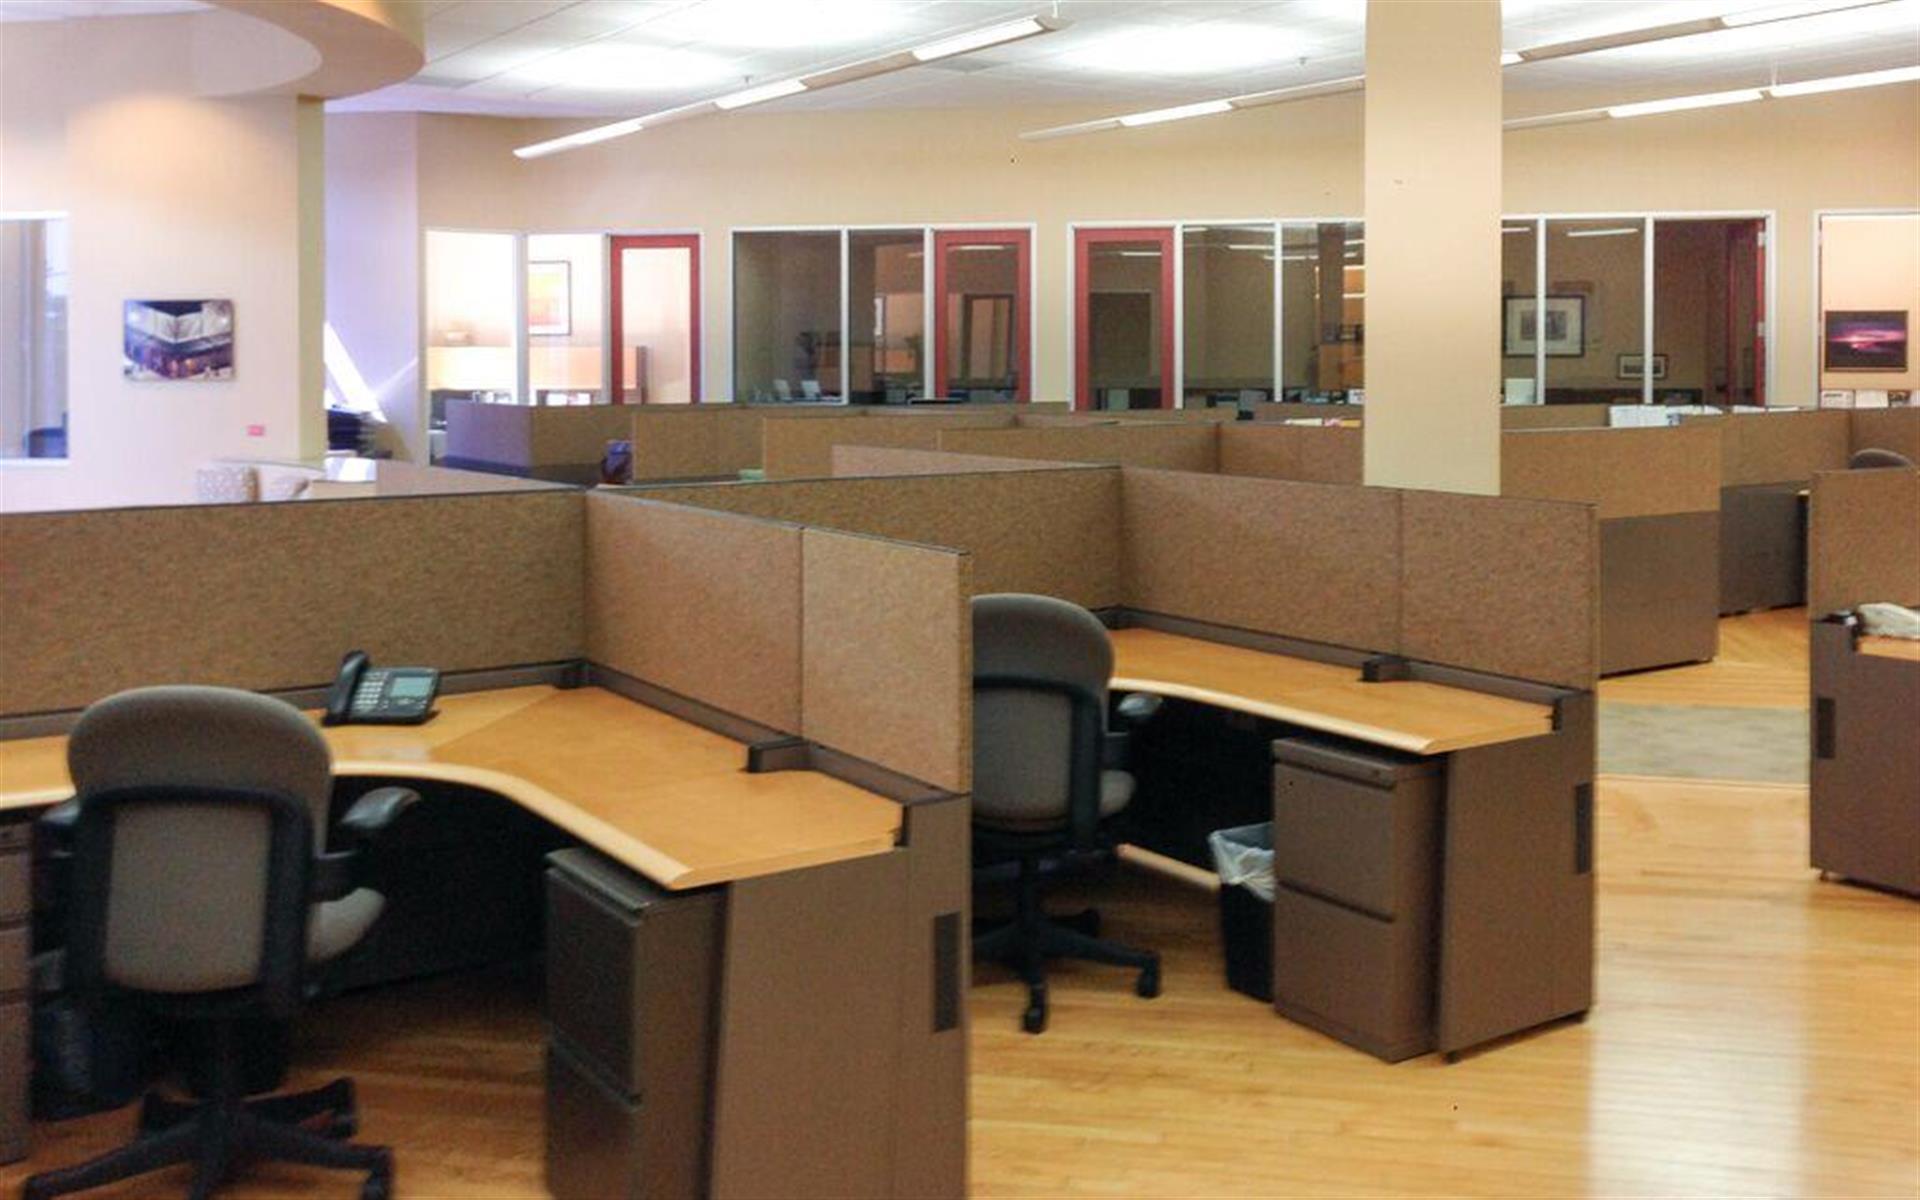 Sebastiani Theatre Building Workspace - Dedicated Desk